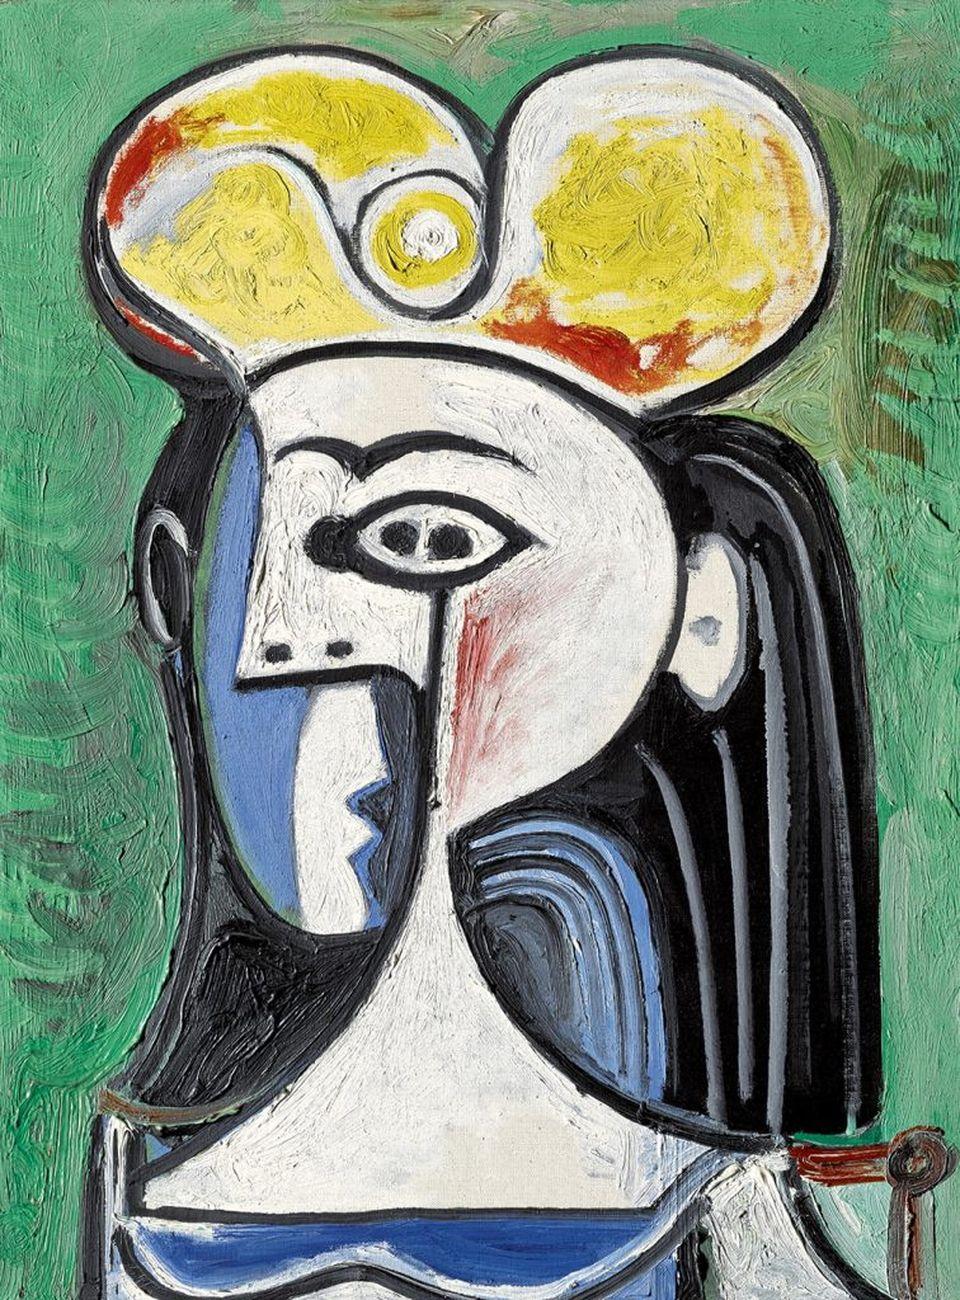 Pablo Picasso, Buste de femme assise, 1962. Courtesy Sotheby's